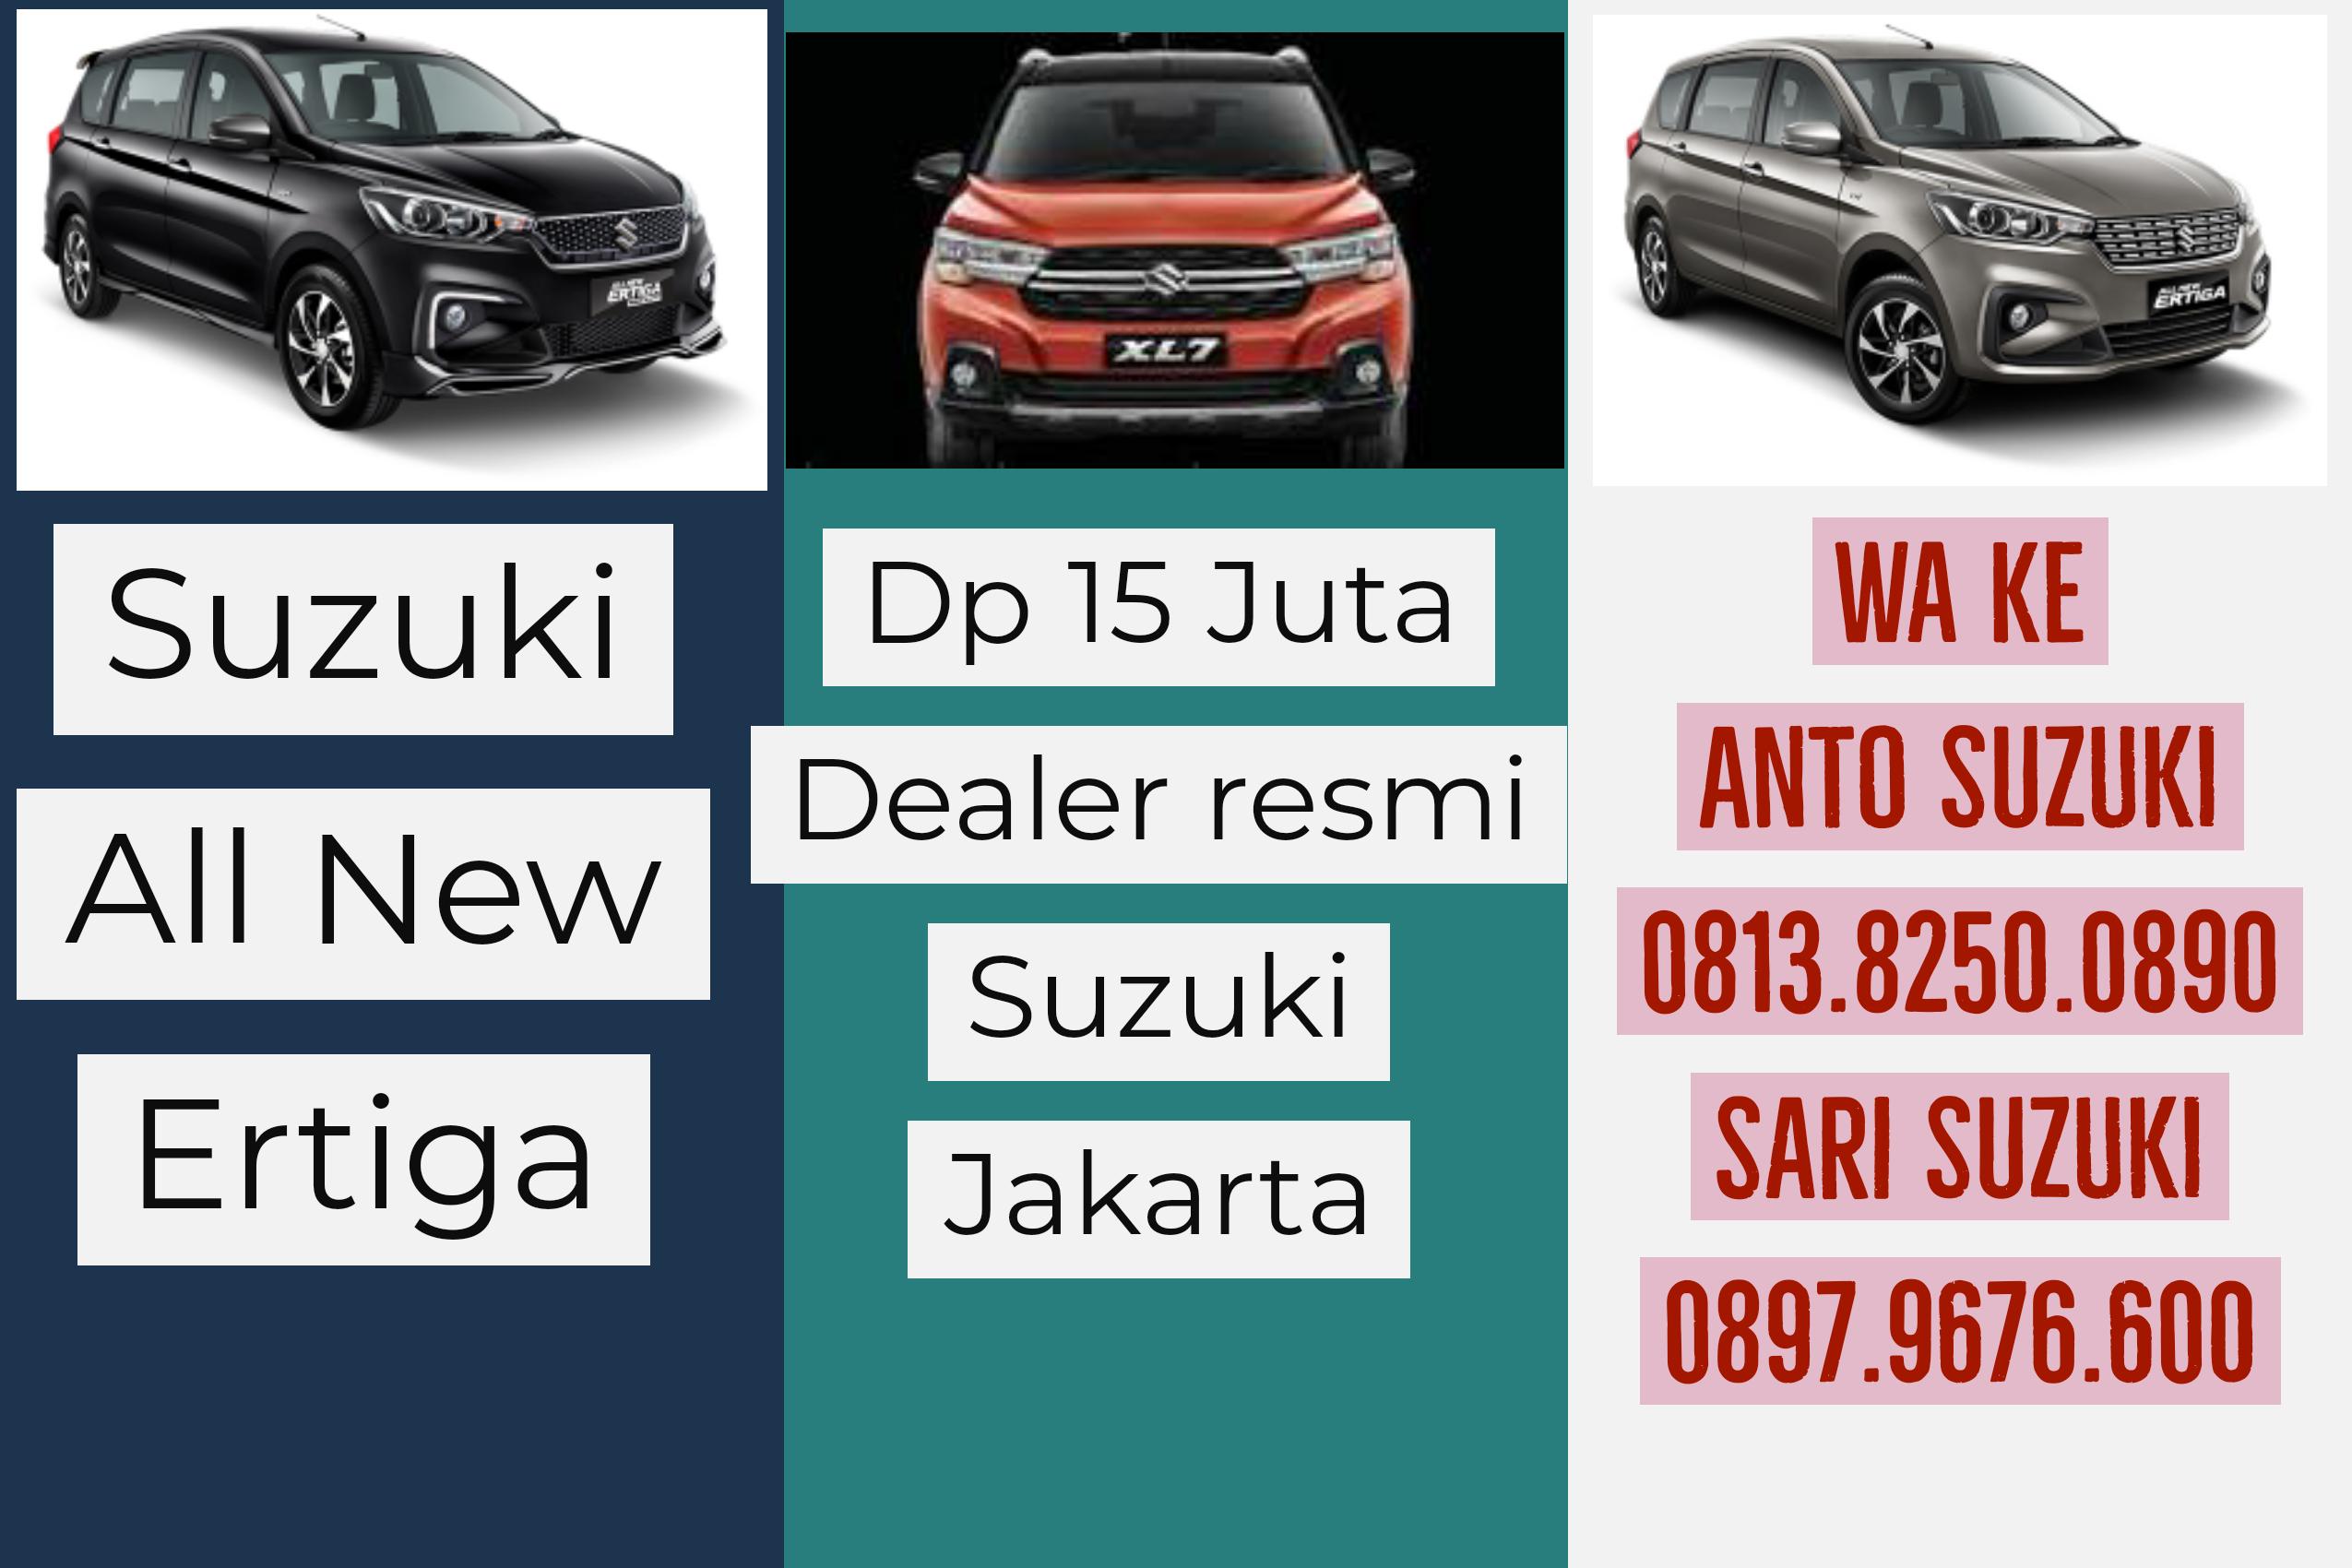 Jenis Suzuki All New Ertiga